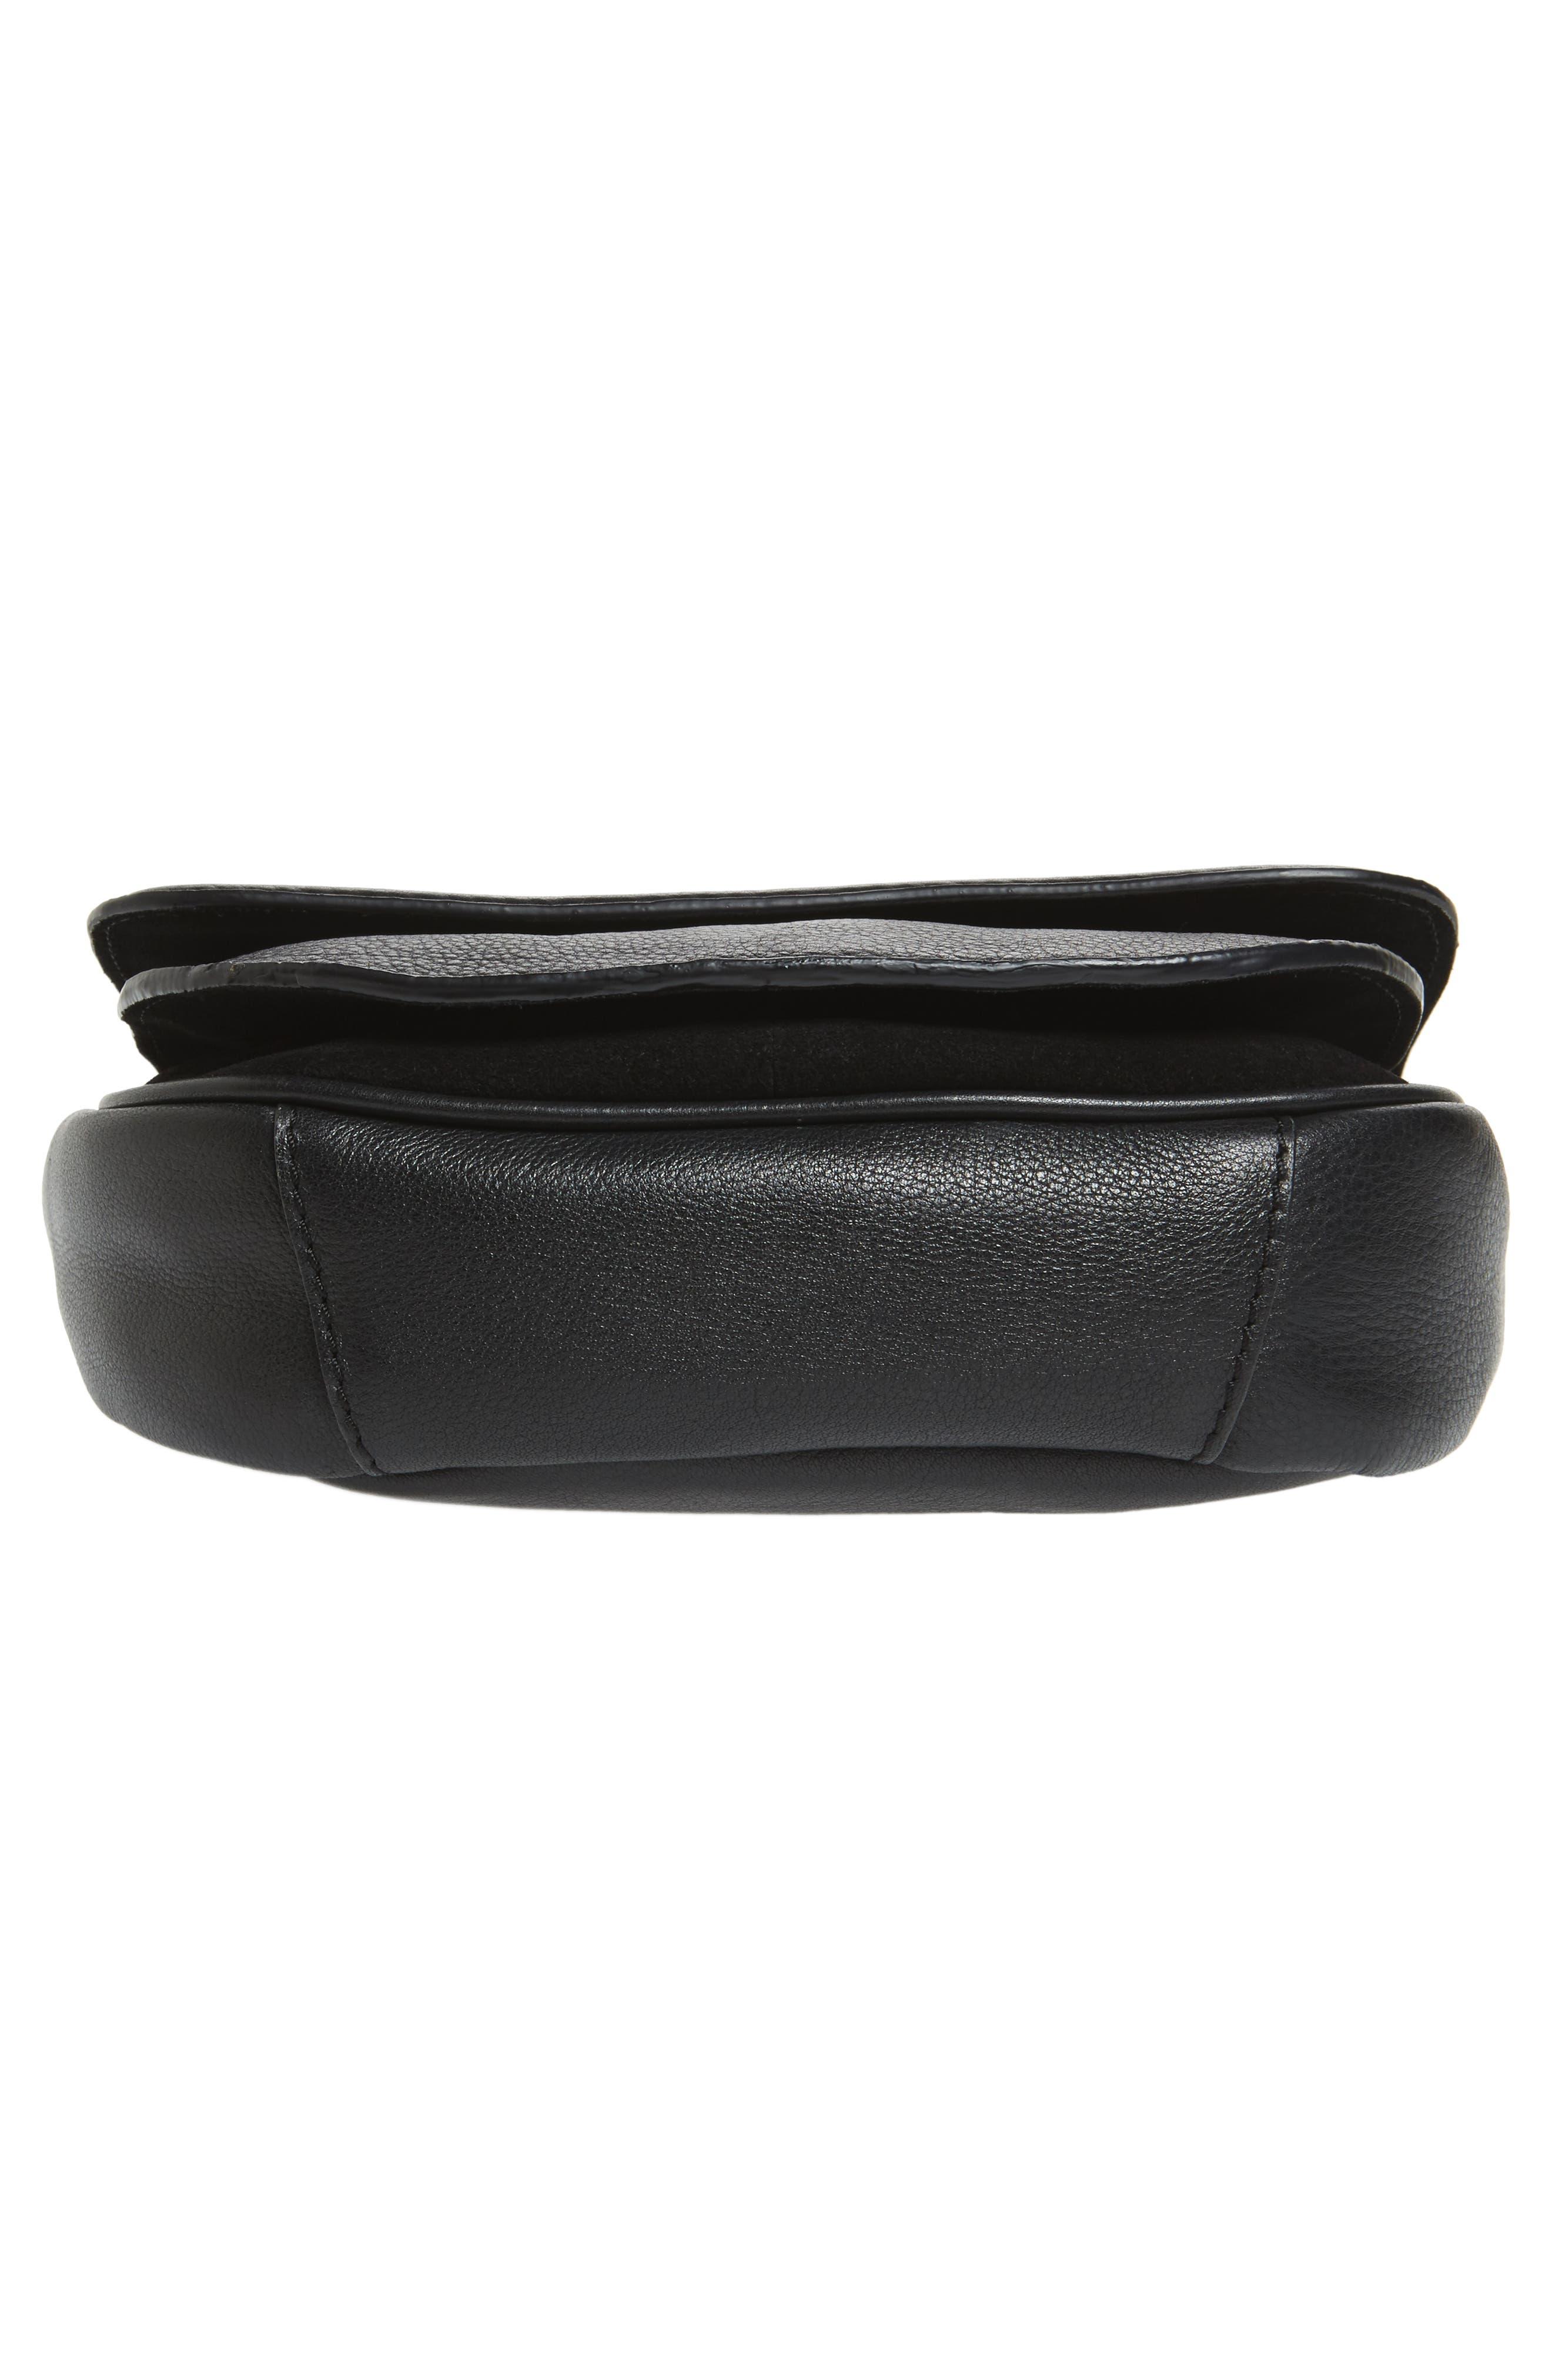 Jasmine Leather Saddle Bag,                             Alternate thumbnail 6, color,                             Black